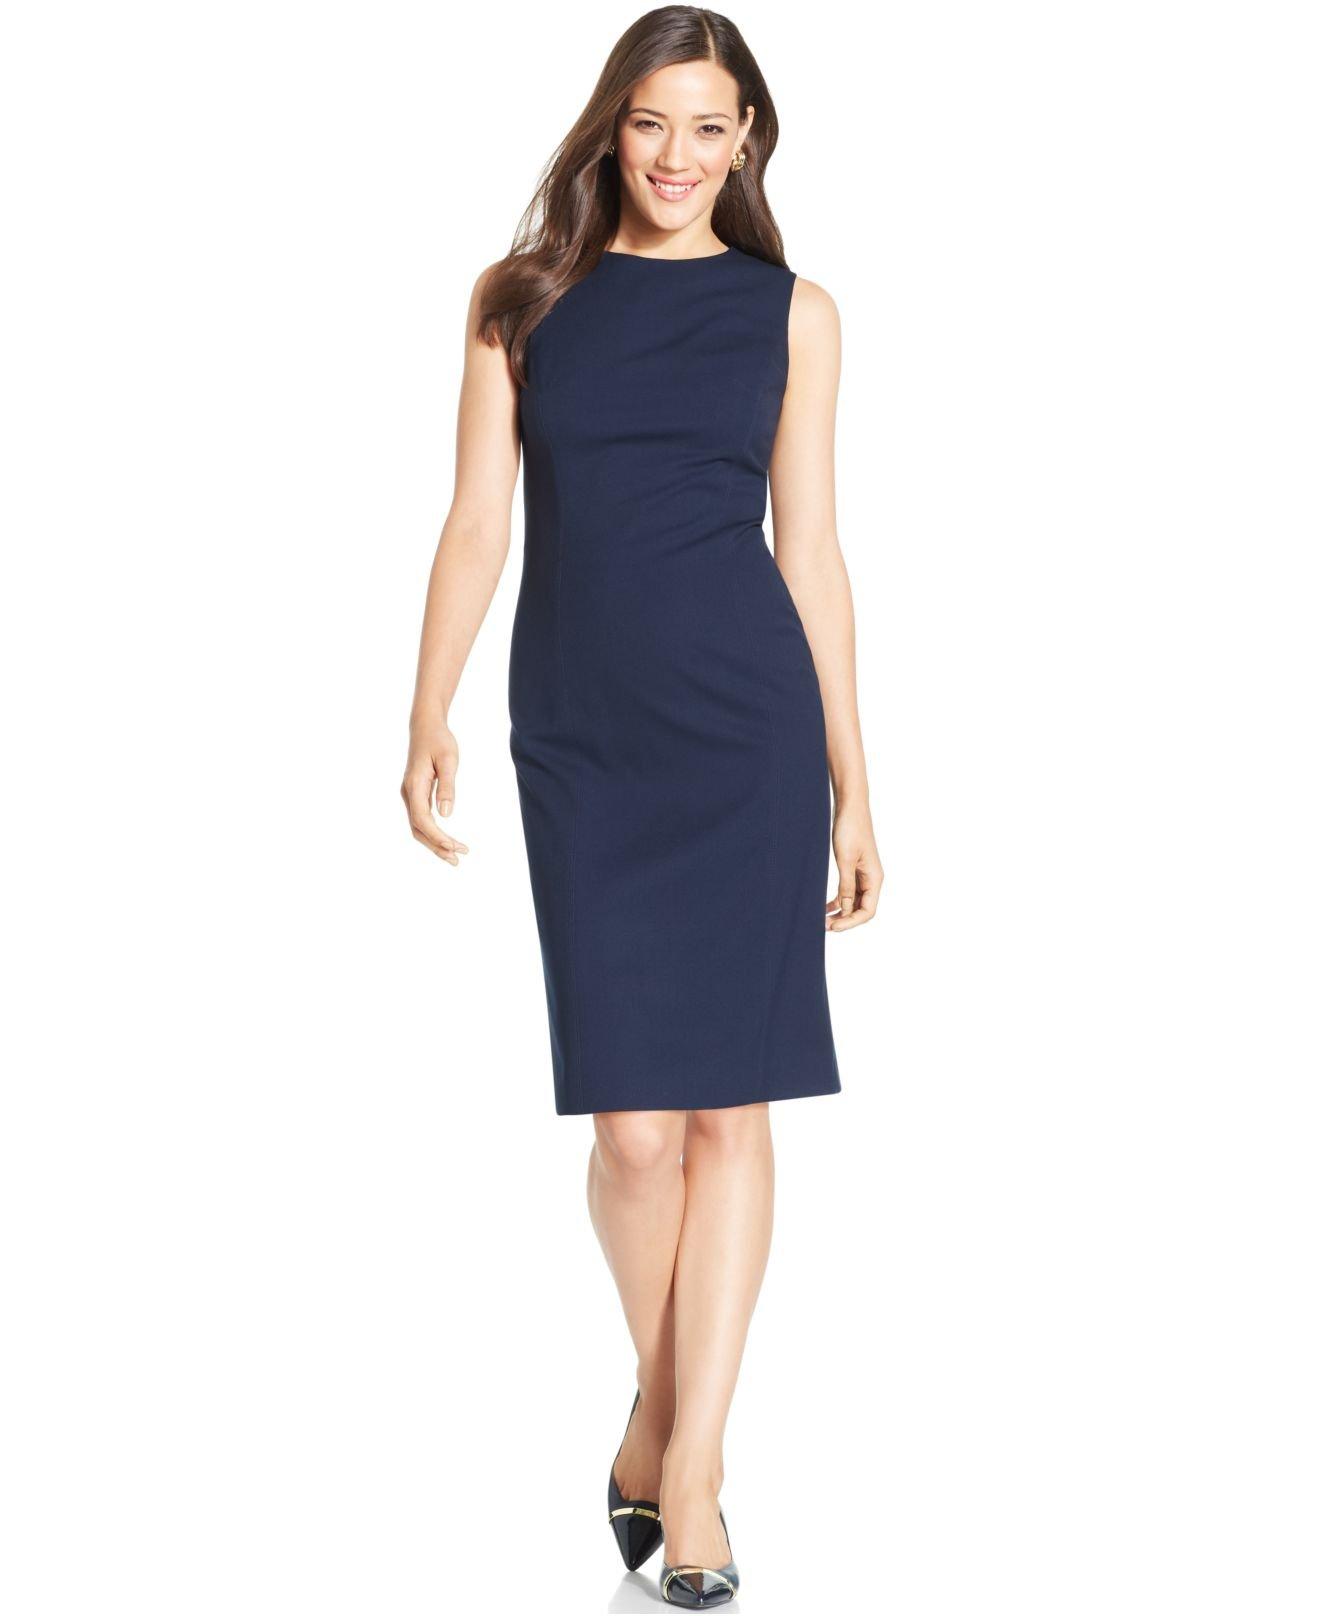 ef3c1d50 Jones New York Sleeveless Seamed Sheath Dress in Blue - Lyst